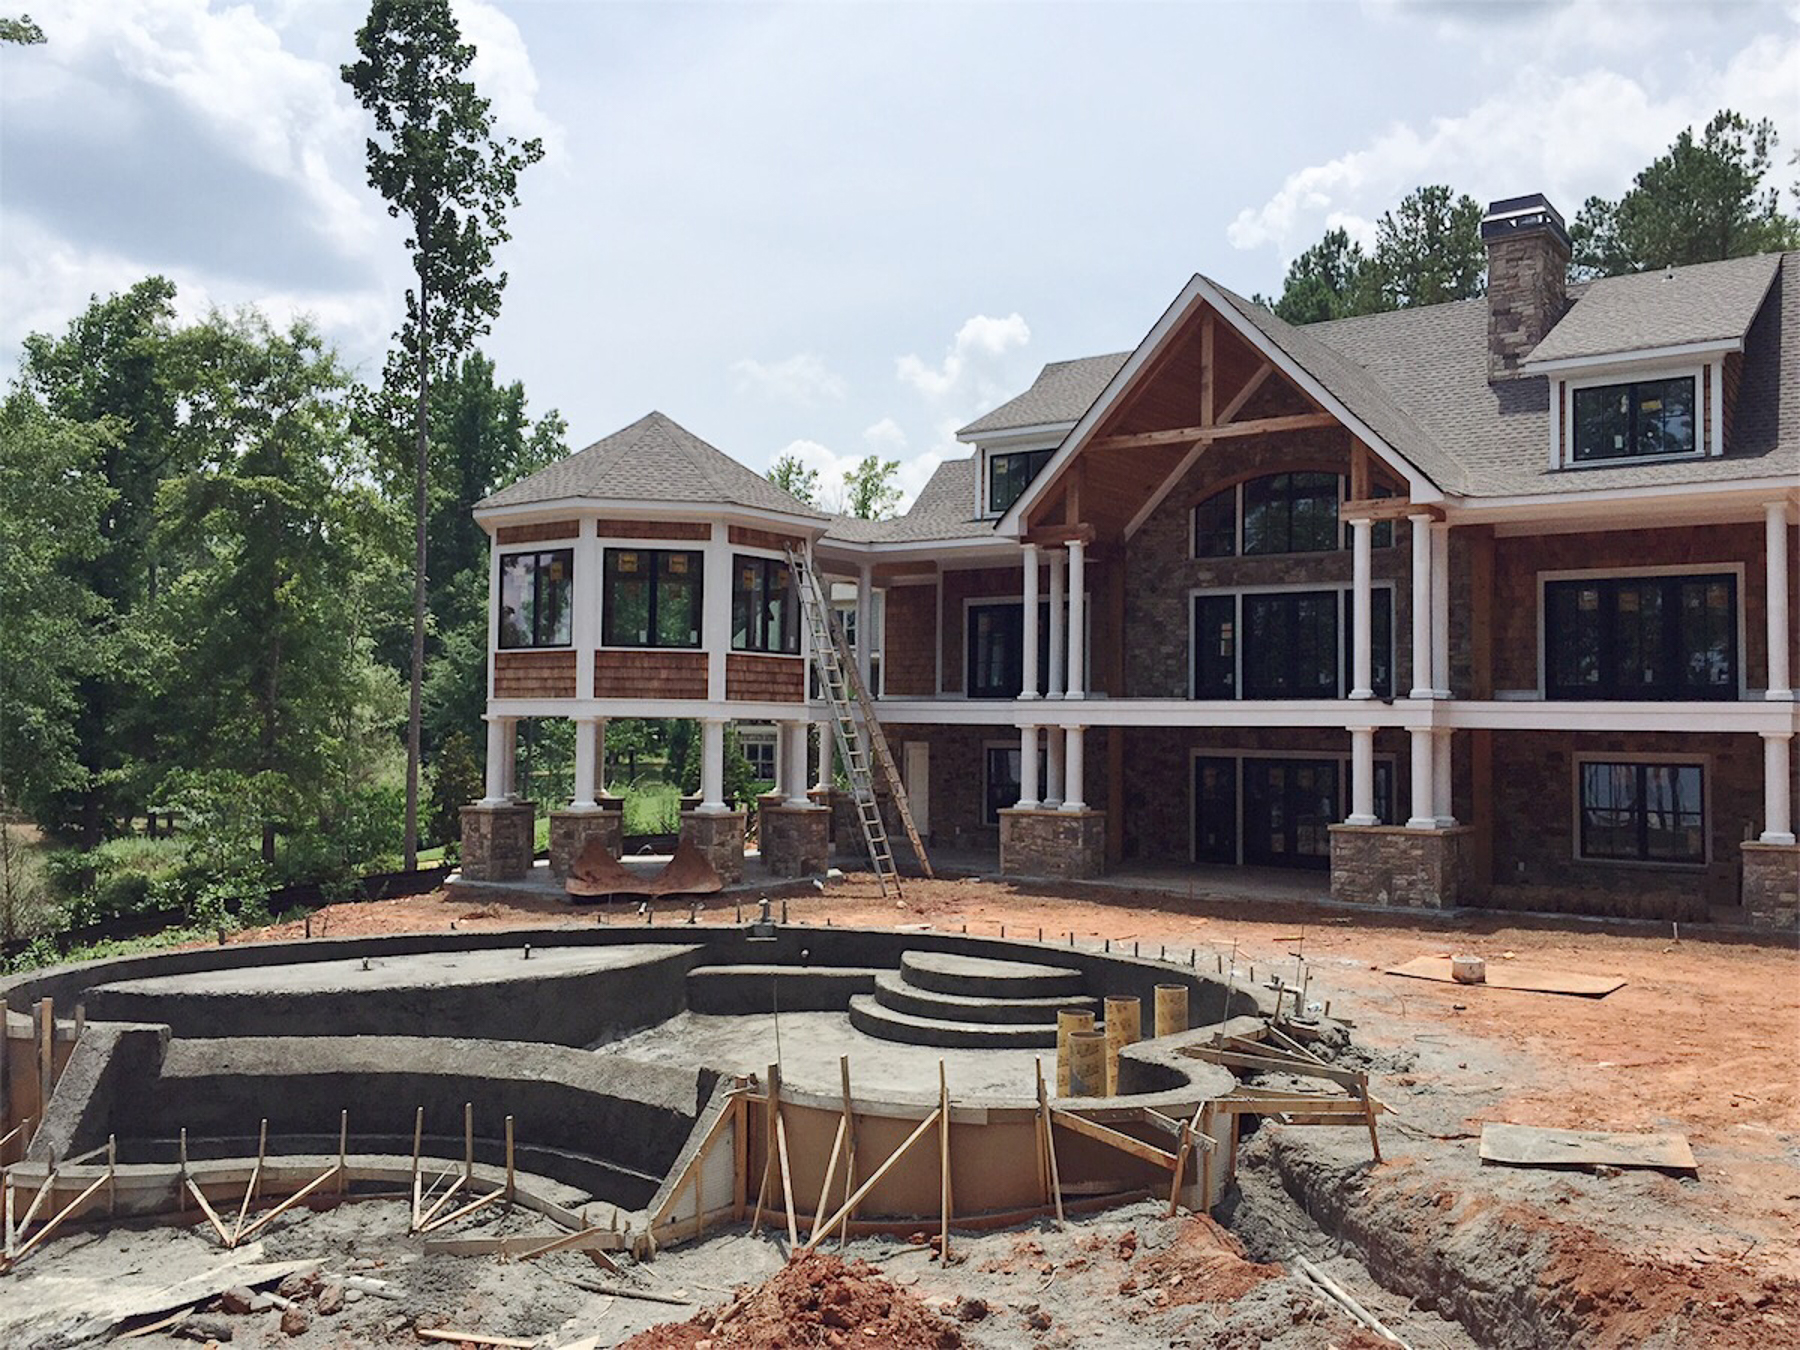 lake oconee lake house in progress exterior.jpg